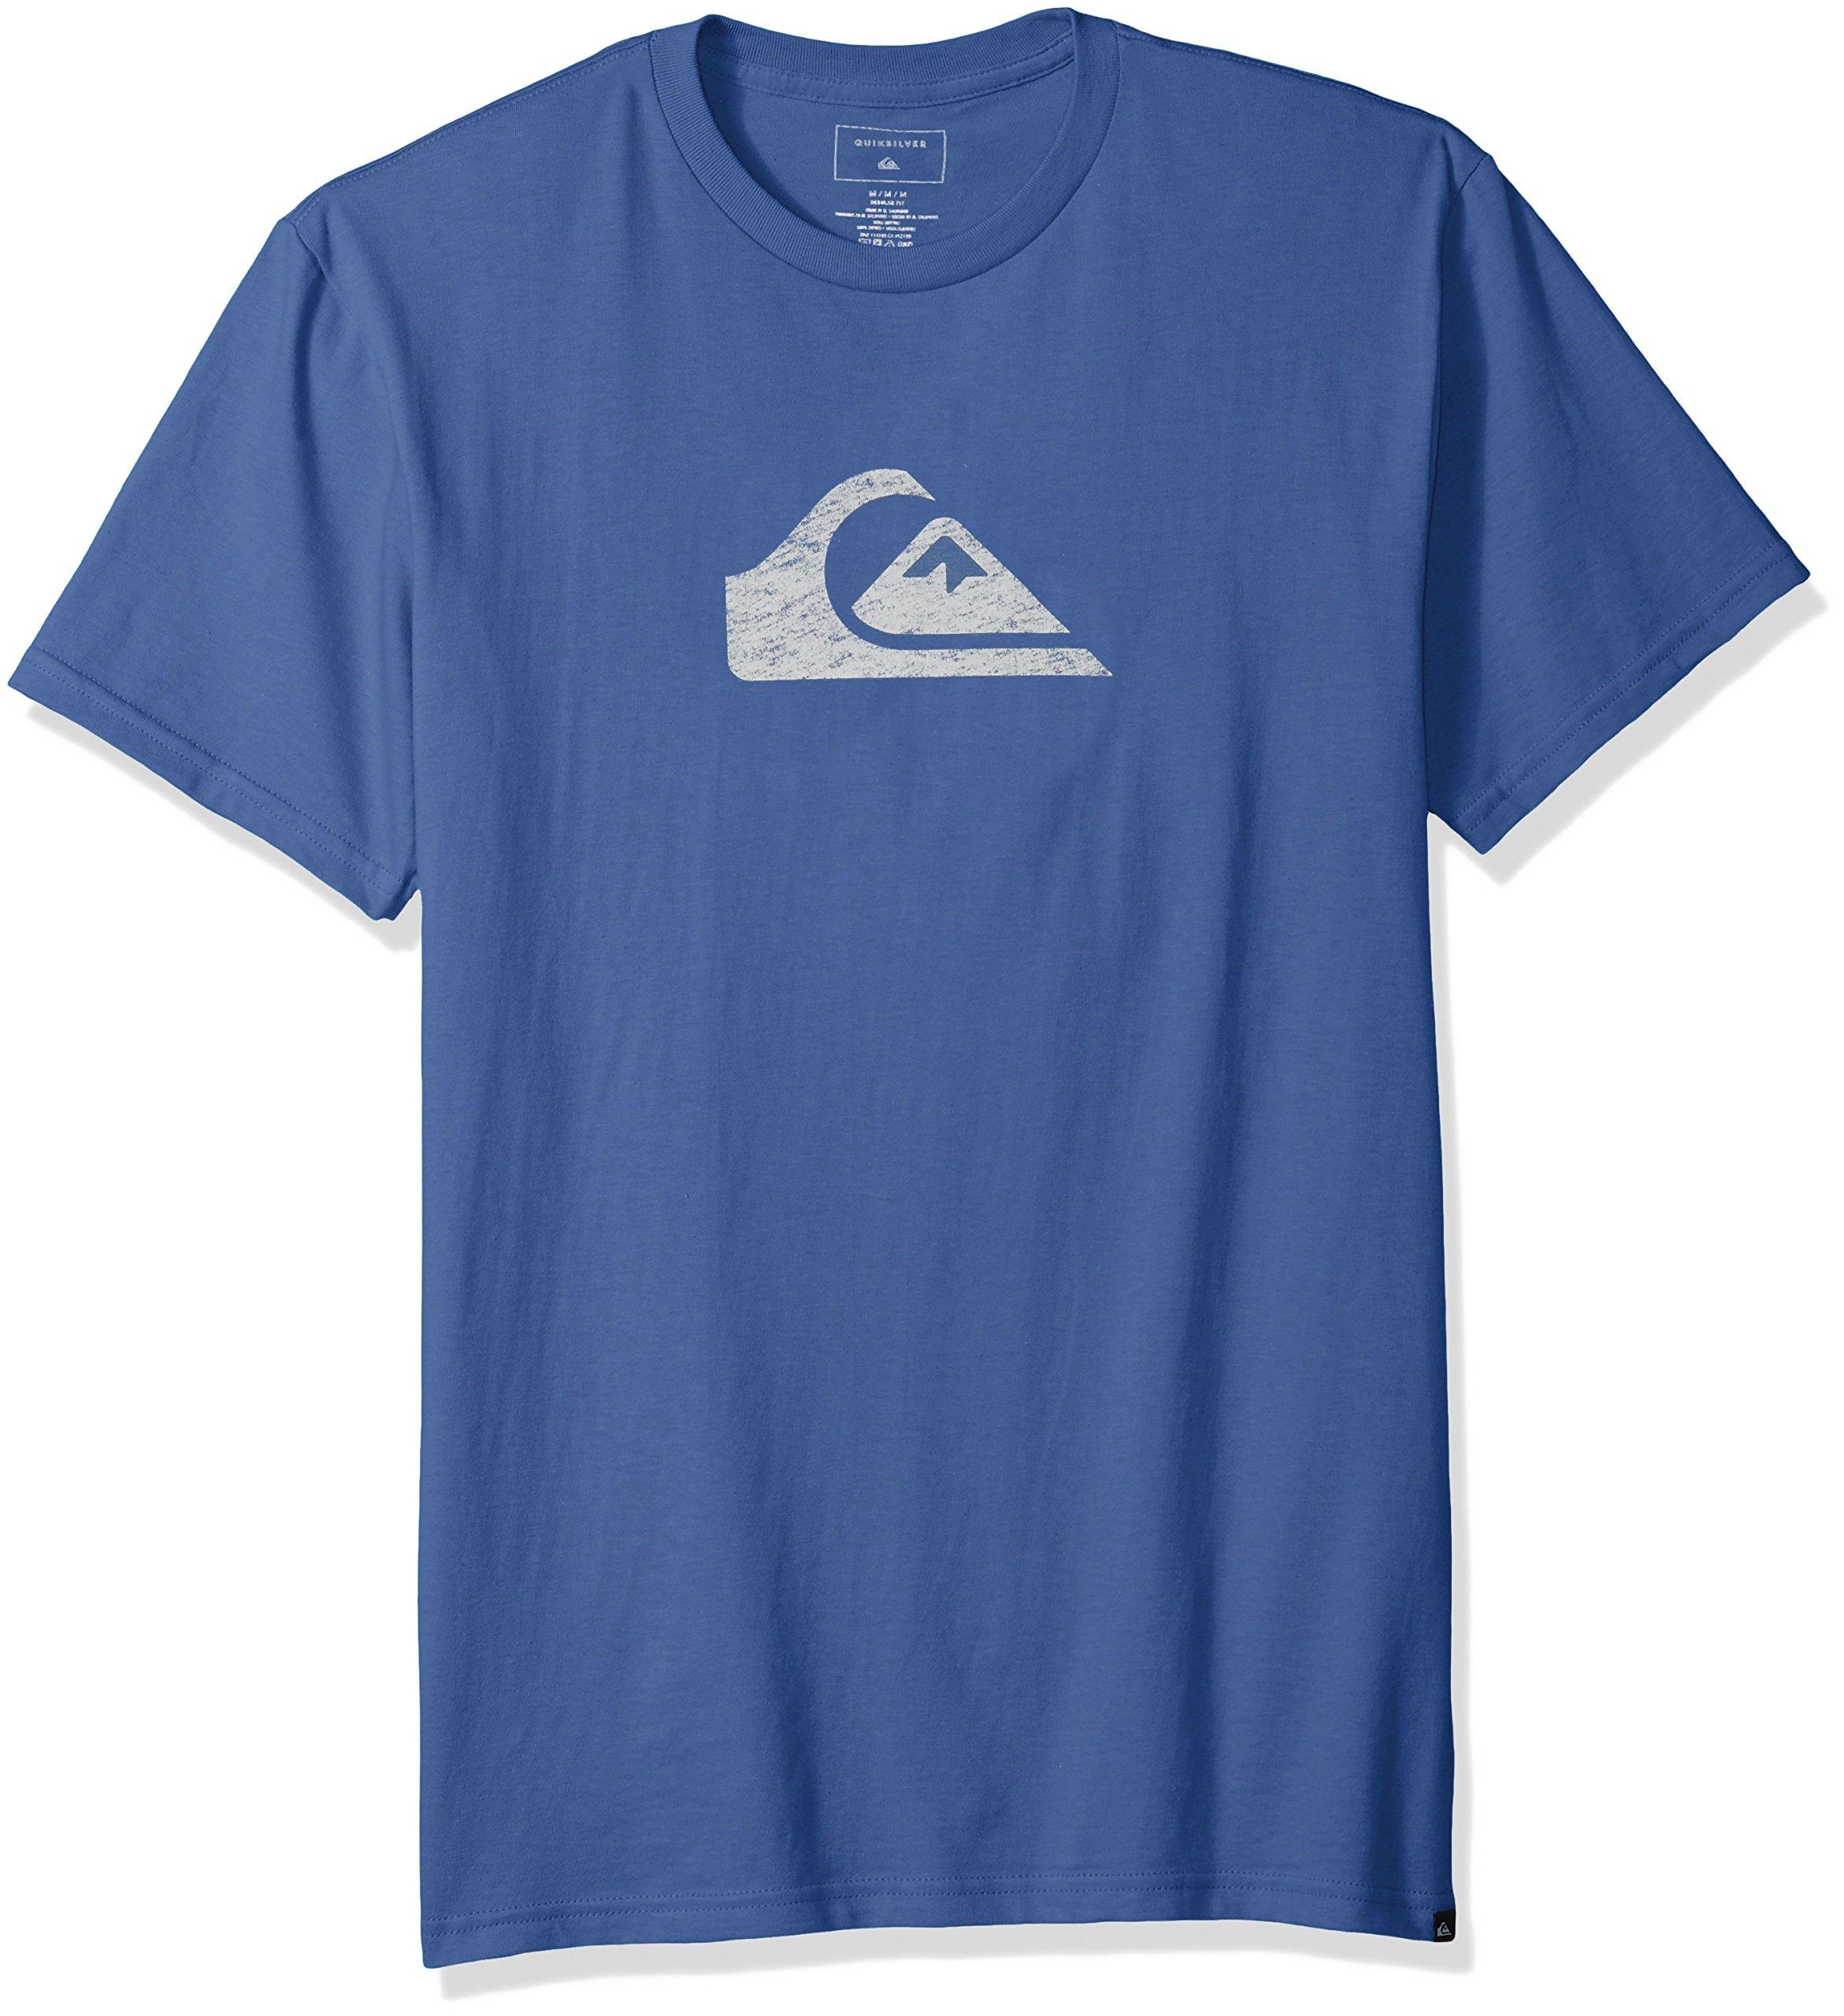 Quiksilver Men's Comp Logo Tee Shirt, Bijou Blue, XXL by Quiksilver (Image #1)